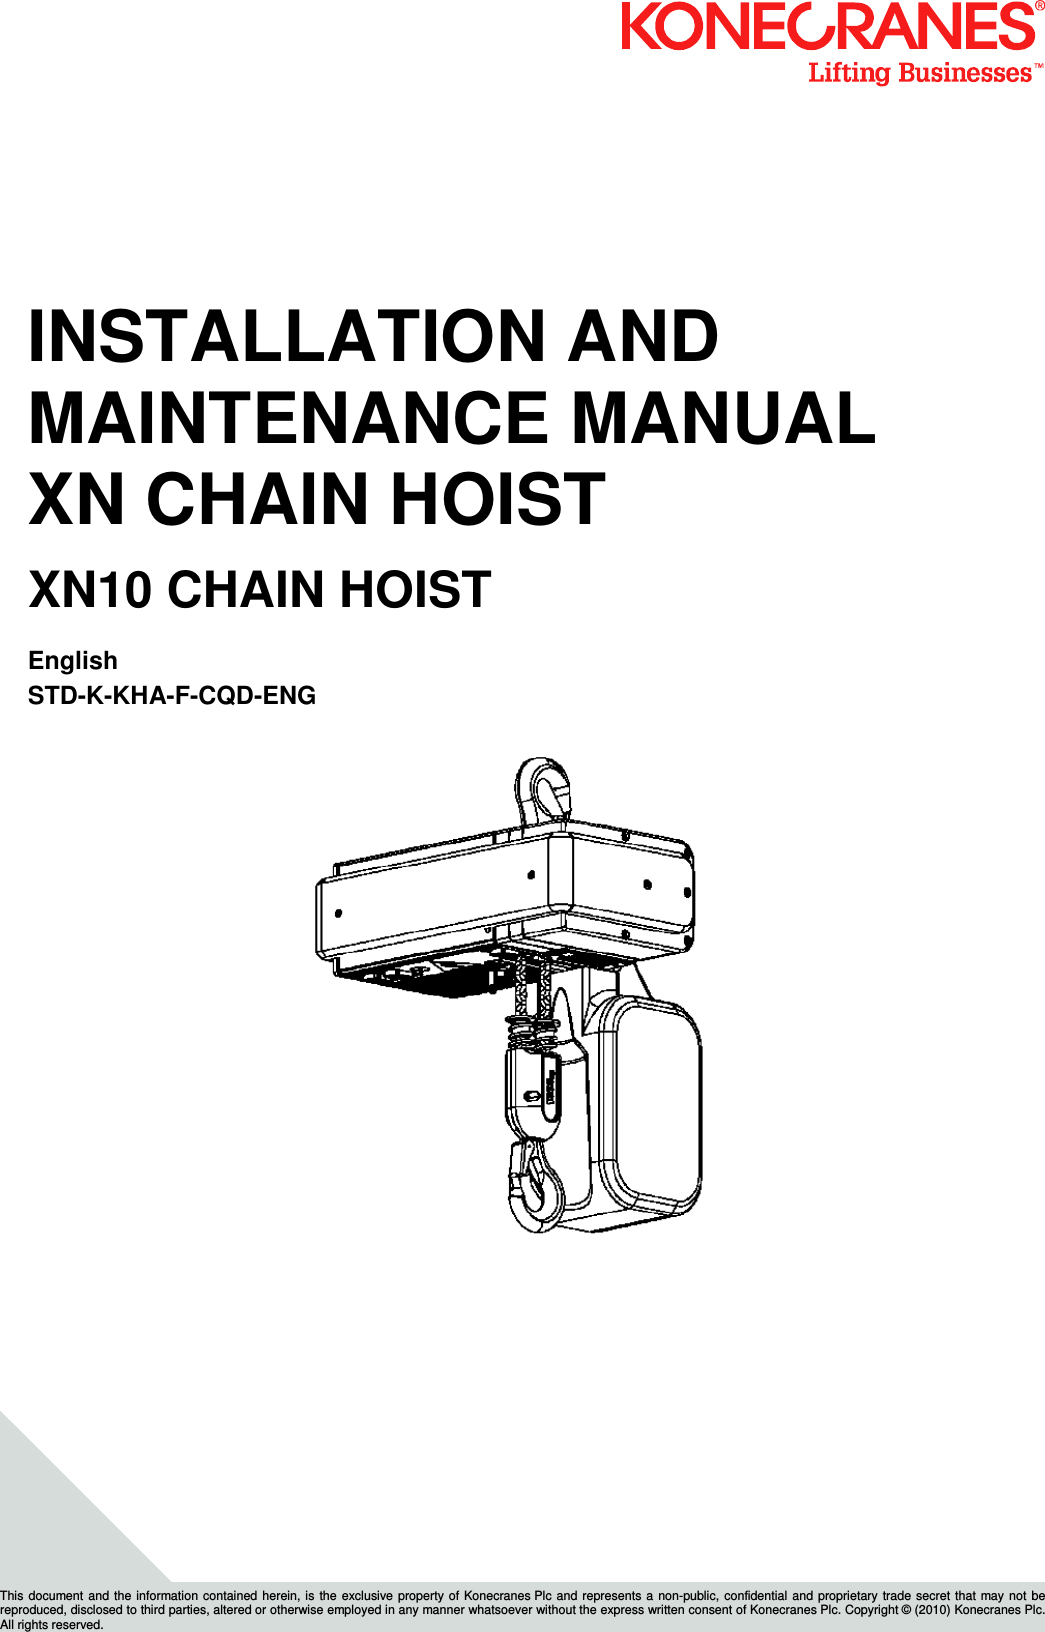 XN10 I&M MANUAL 2010 0 Kone Cranes Hoist